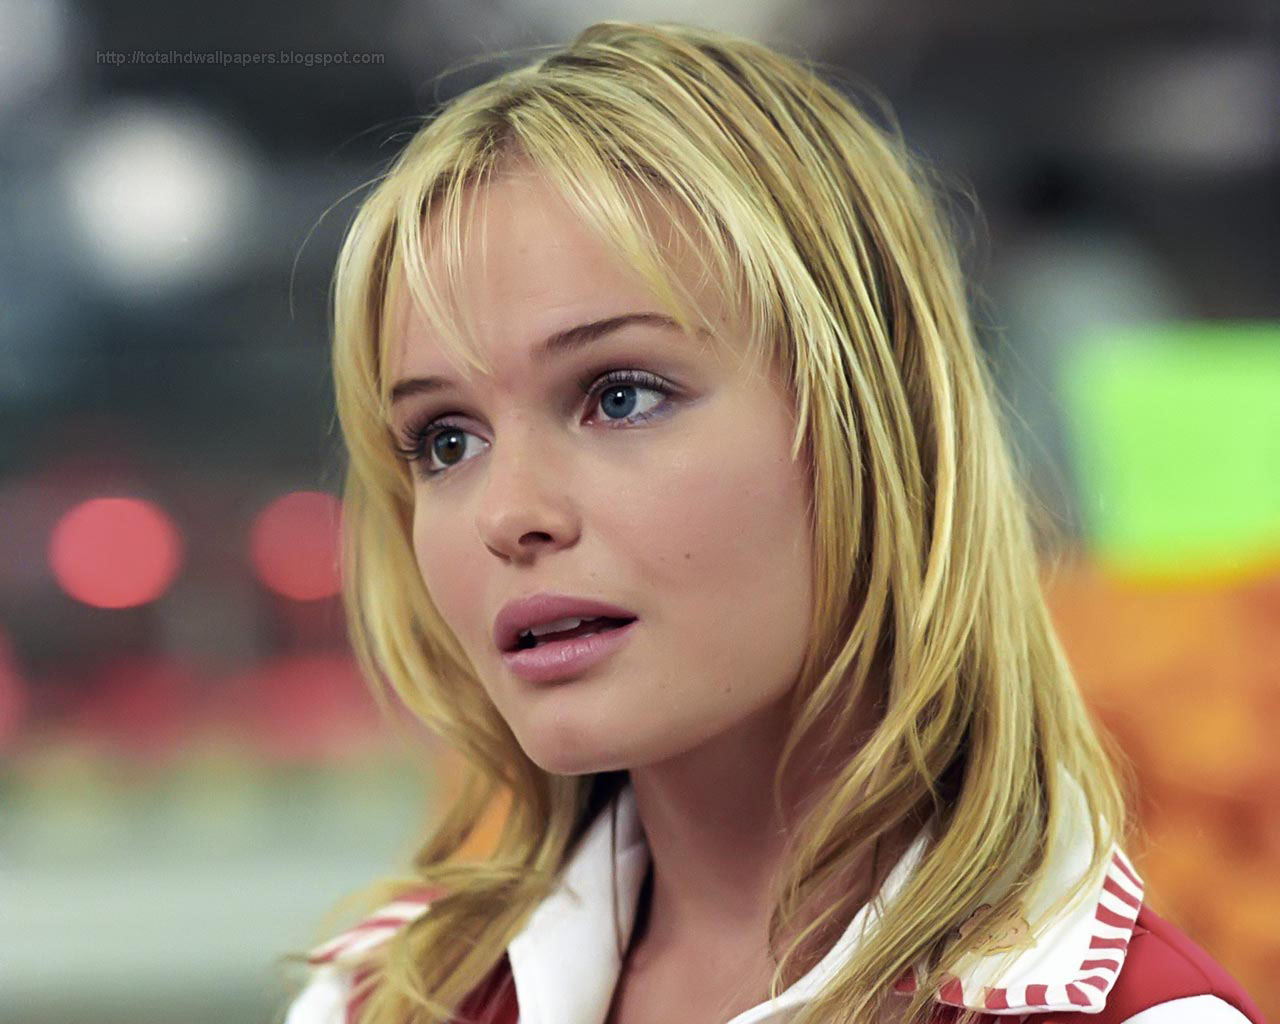 Actress HD Wallpapers Hollywood Actress HD Wallpapers Hollywood 1280x1024